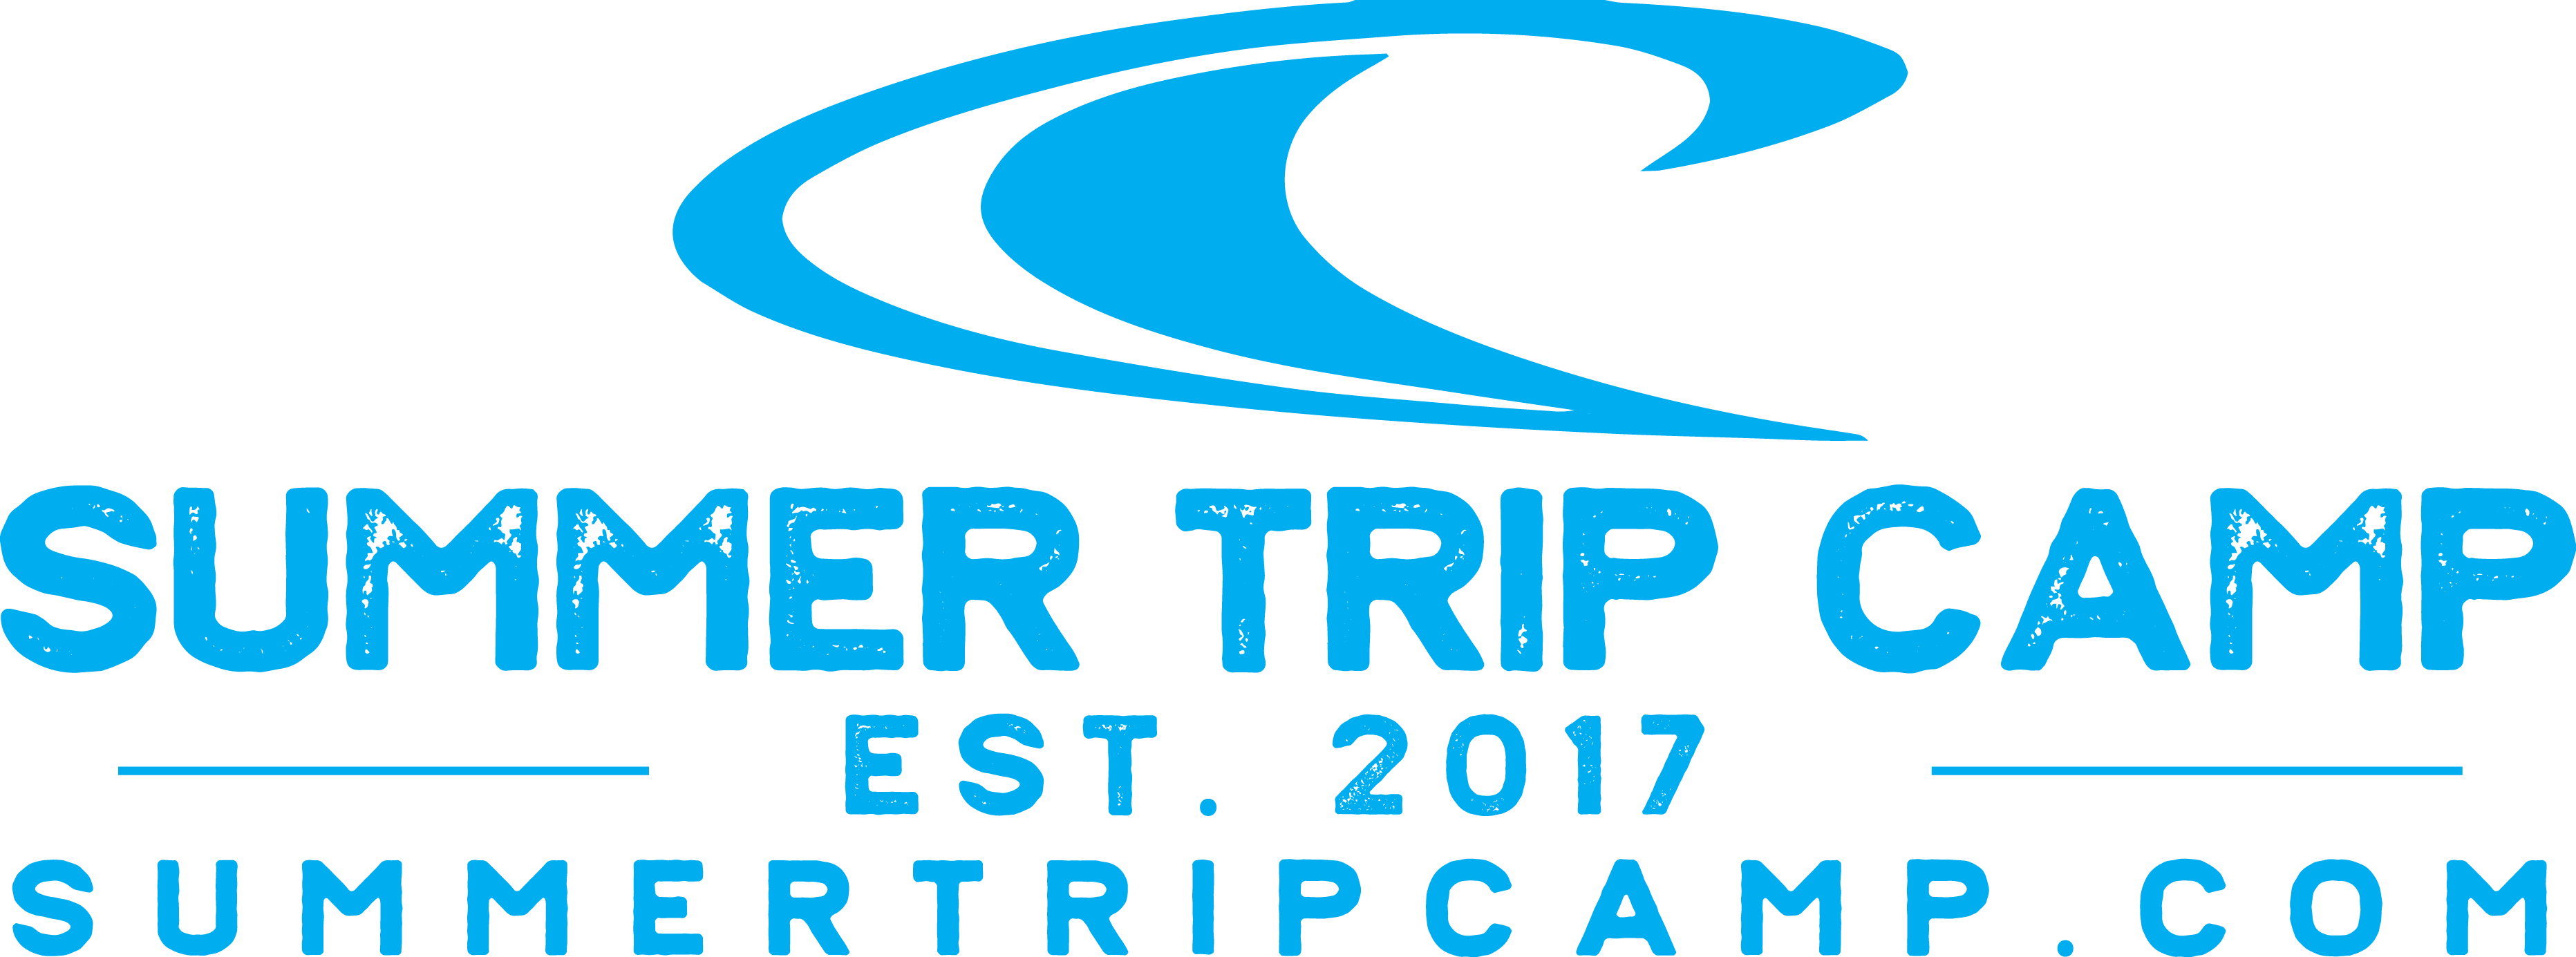 ryan-wexelblatt-summer-trip-camp-director